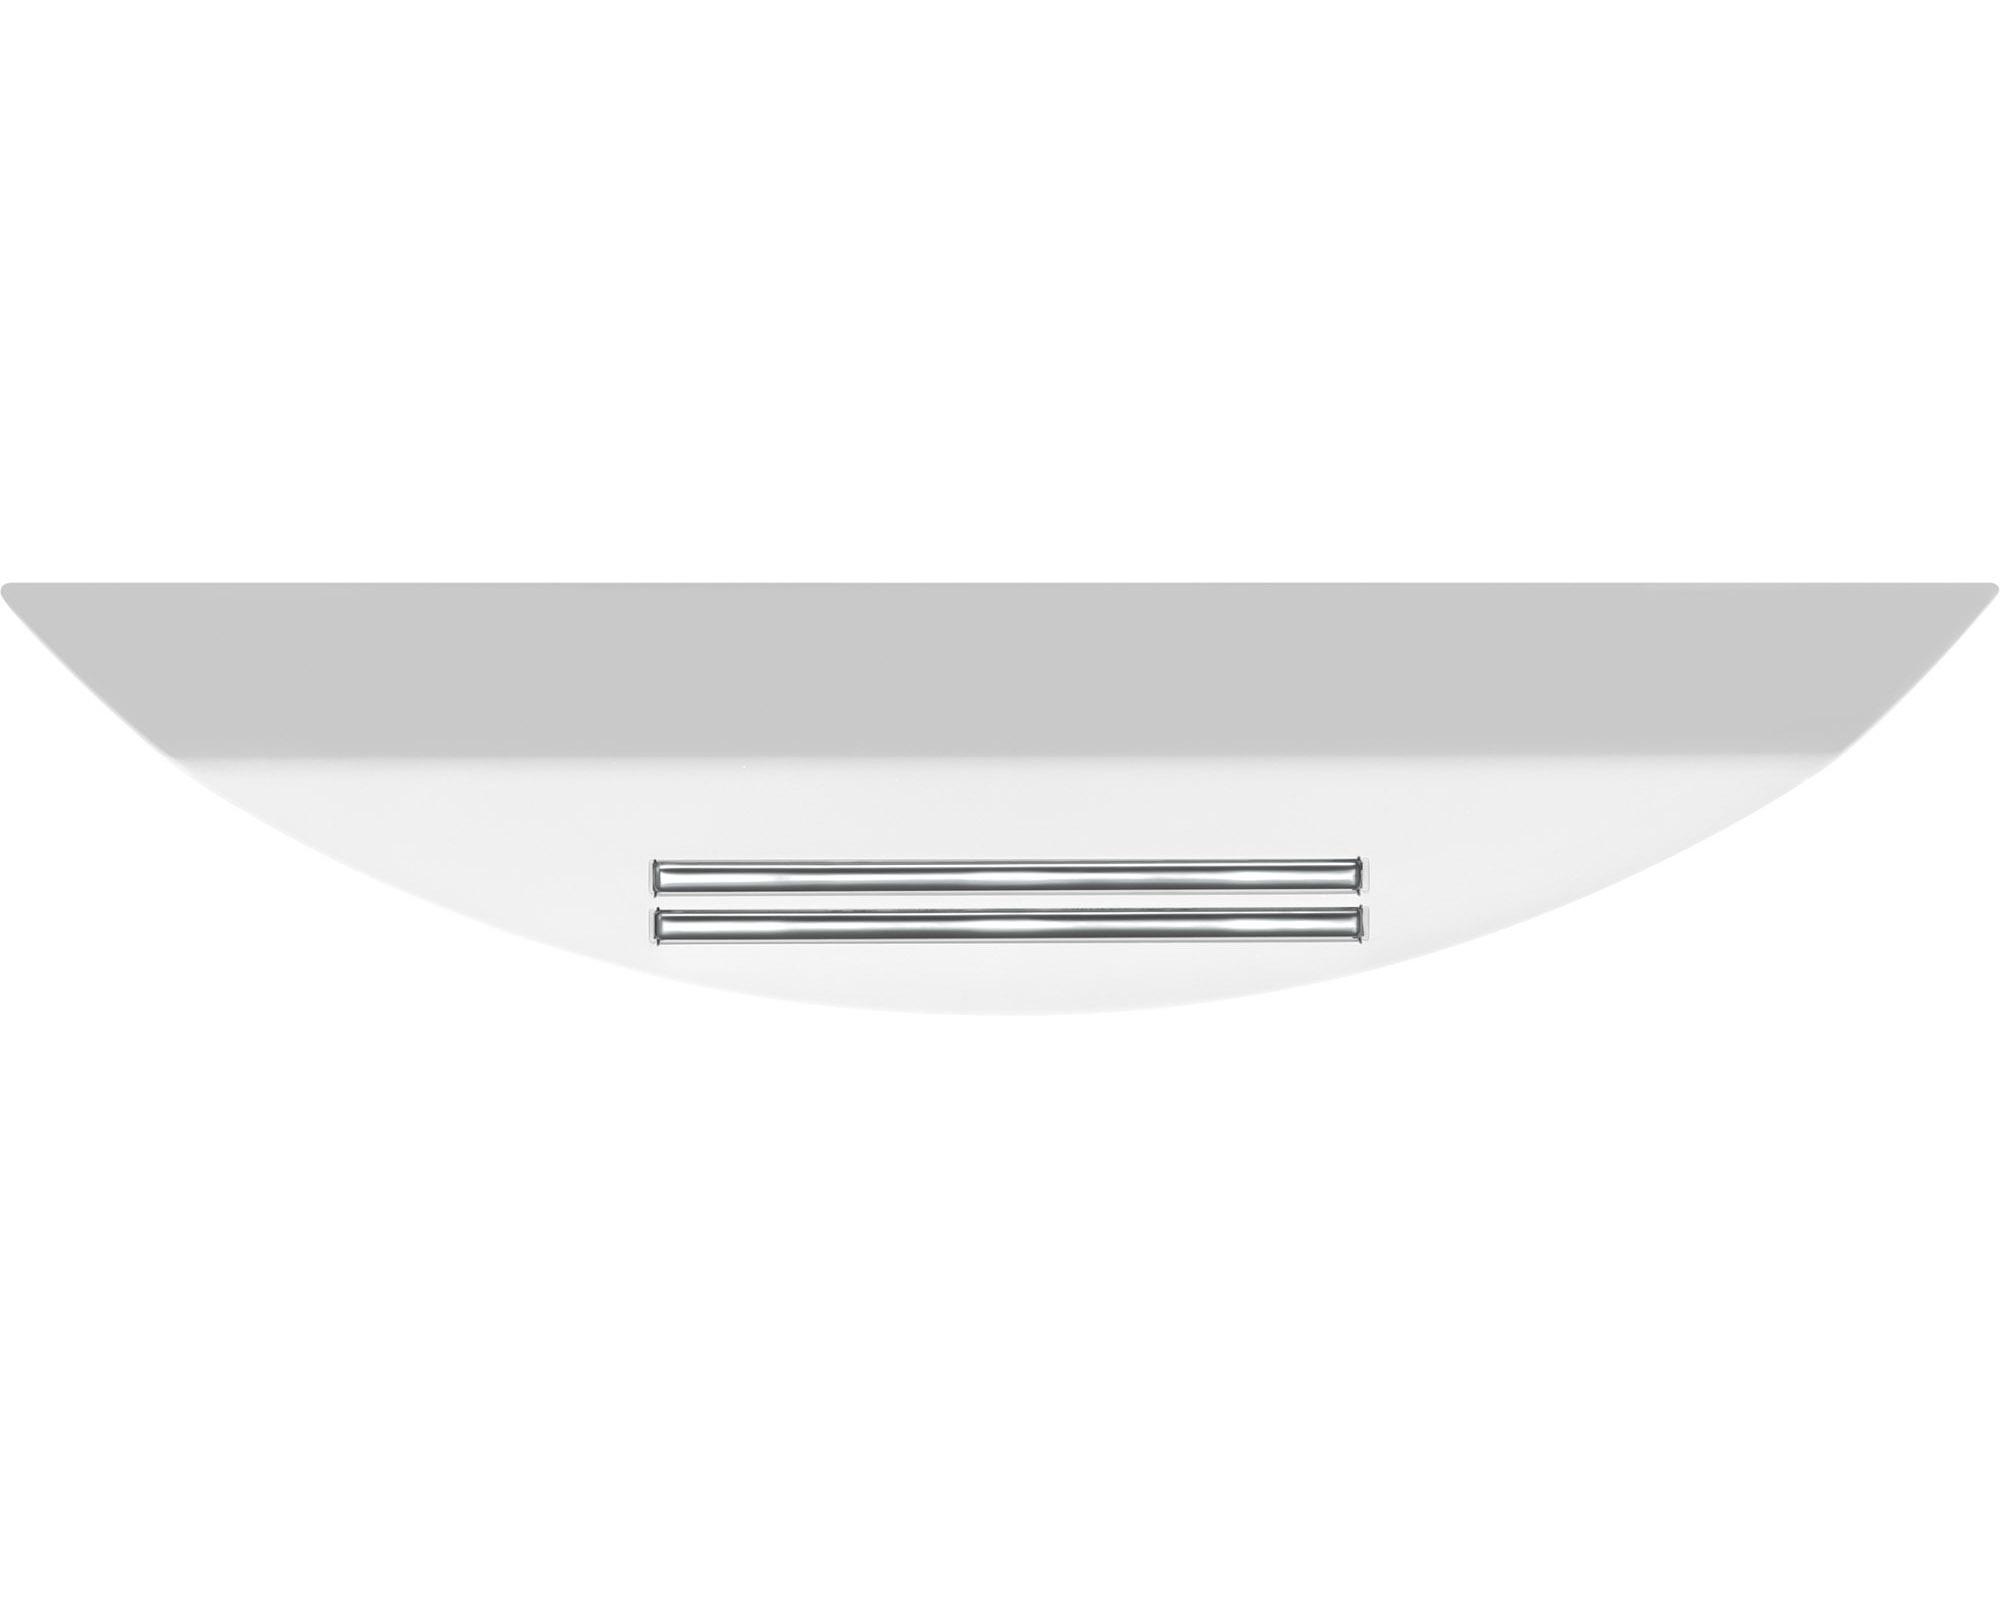 "Frigidaire FFLE4033QT HE 27"" Super Capacity 3.8 cu. ft. Electric Laundry Center - Metallic"